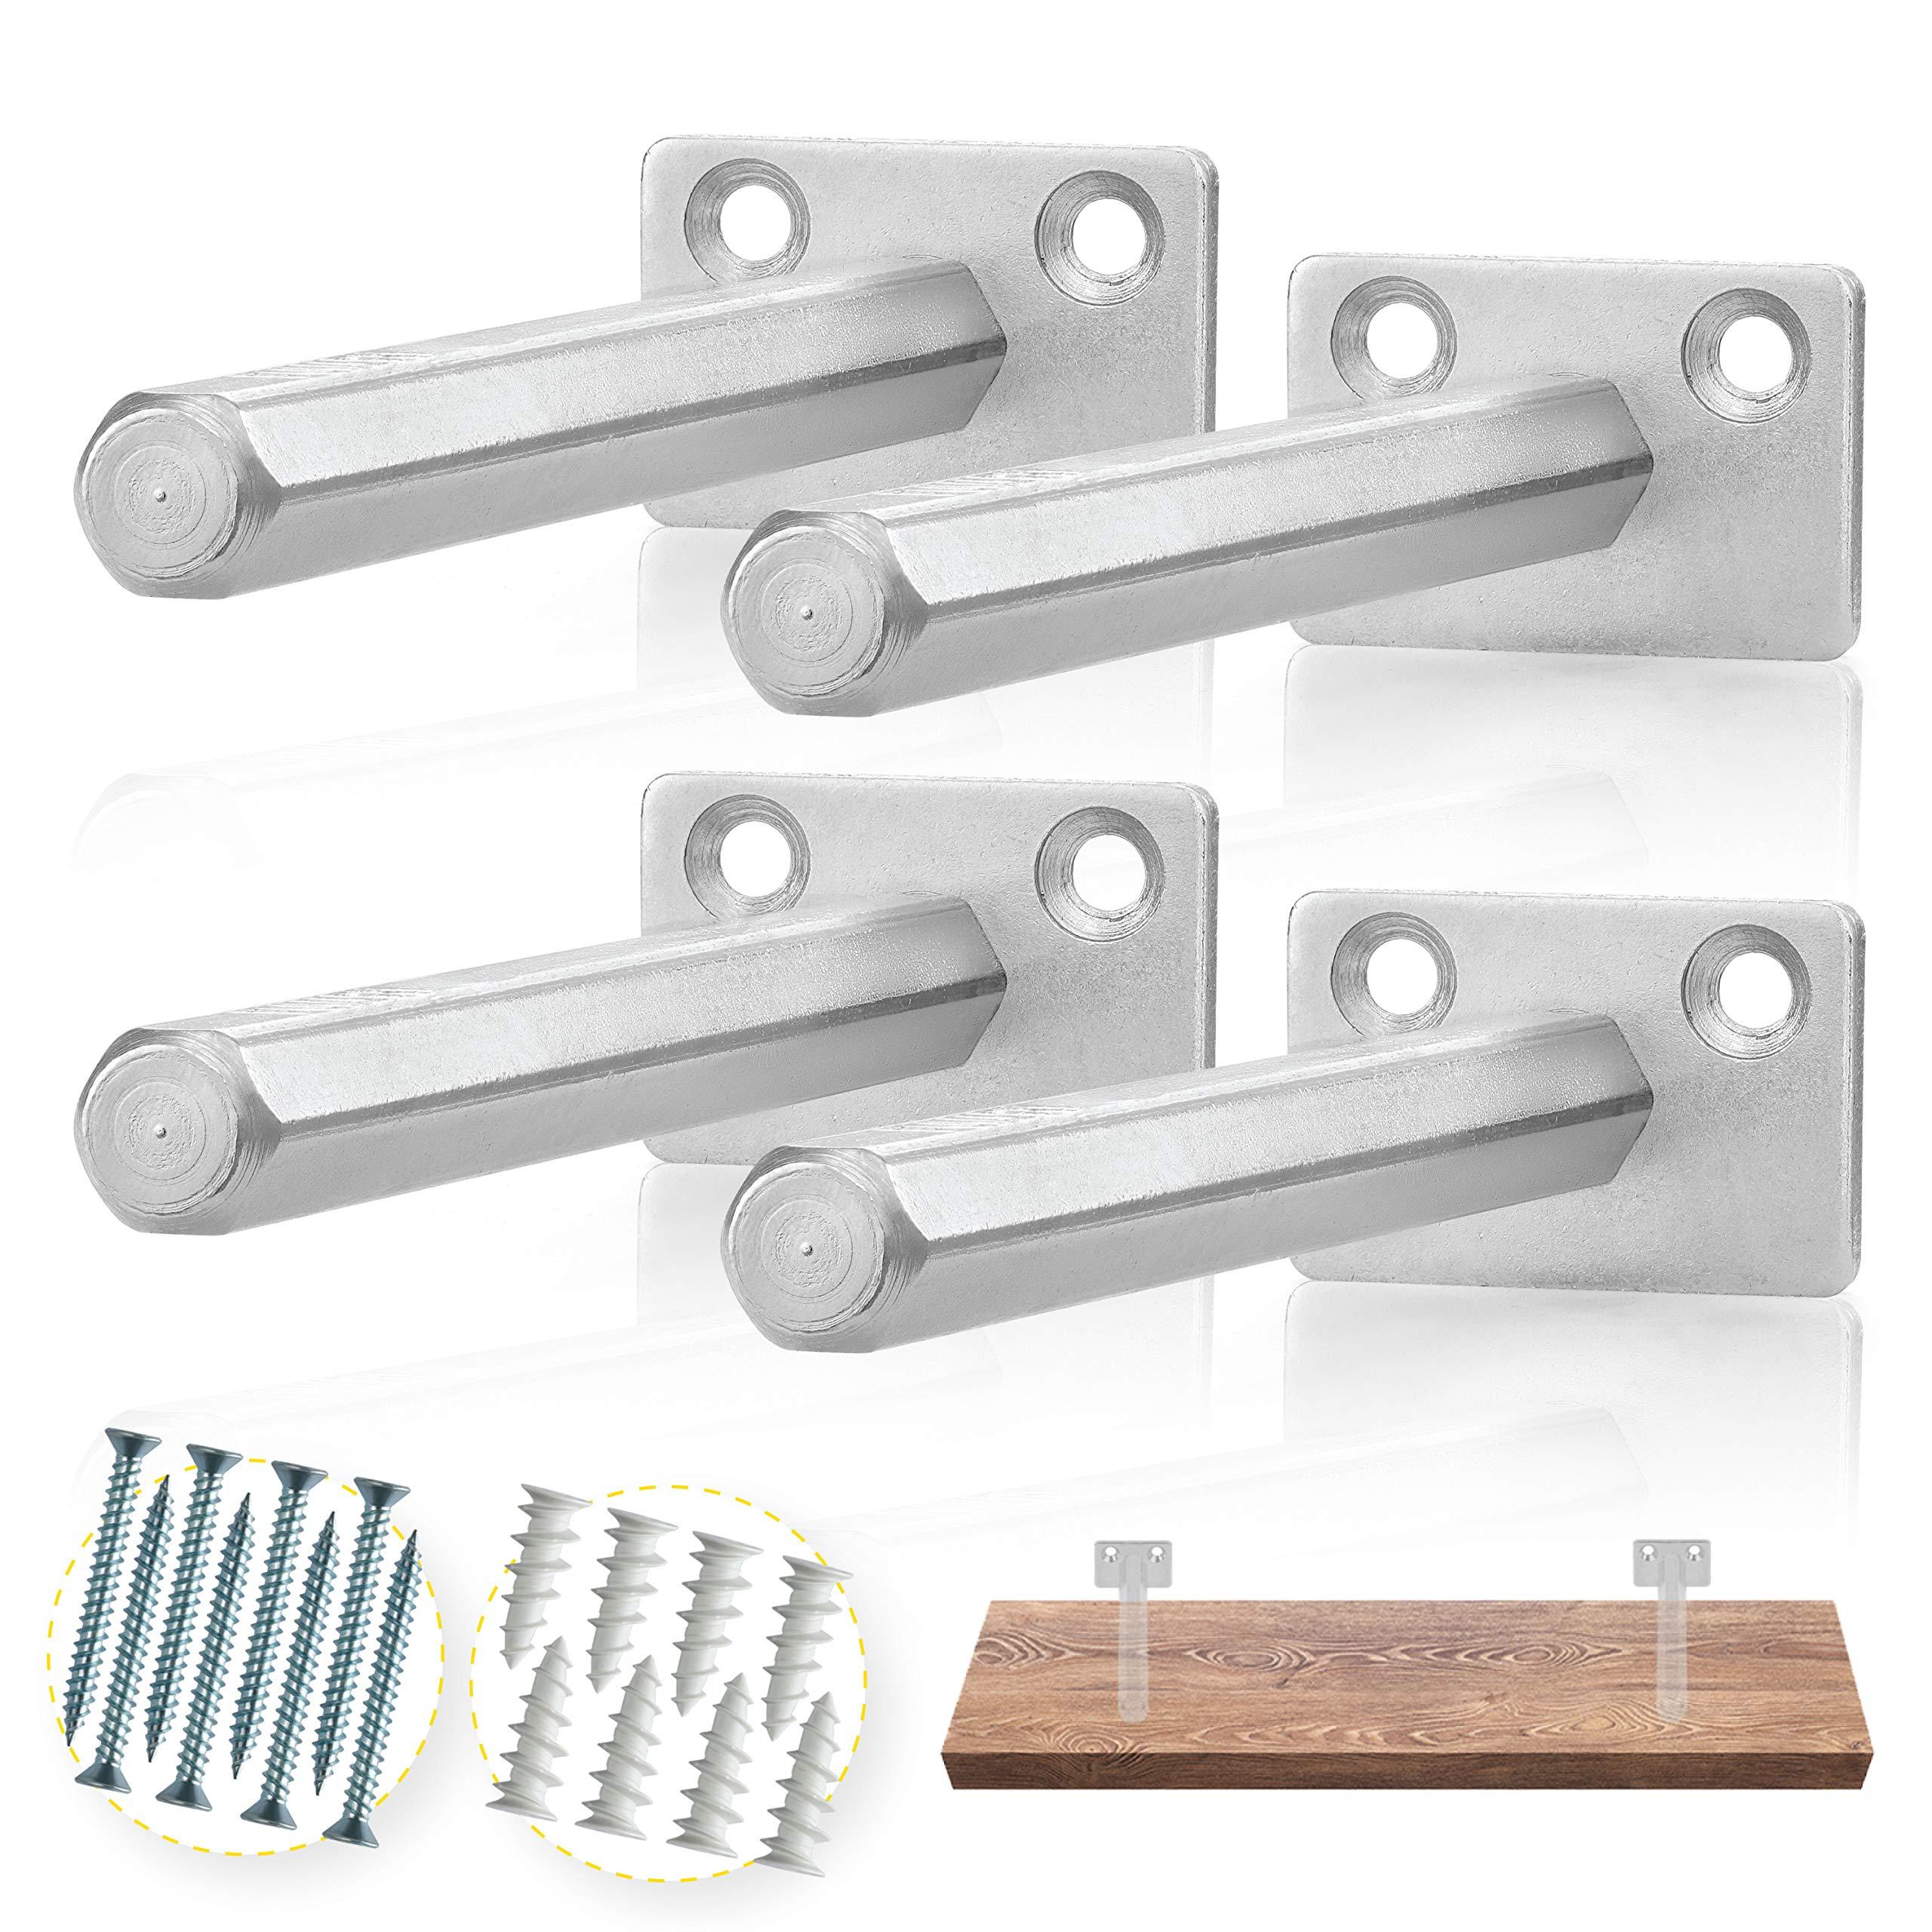 8Pcs 9Inch Hidden Shelf Brackets Heavy Duty Invisible Blind Support Wall Shelf